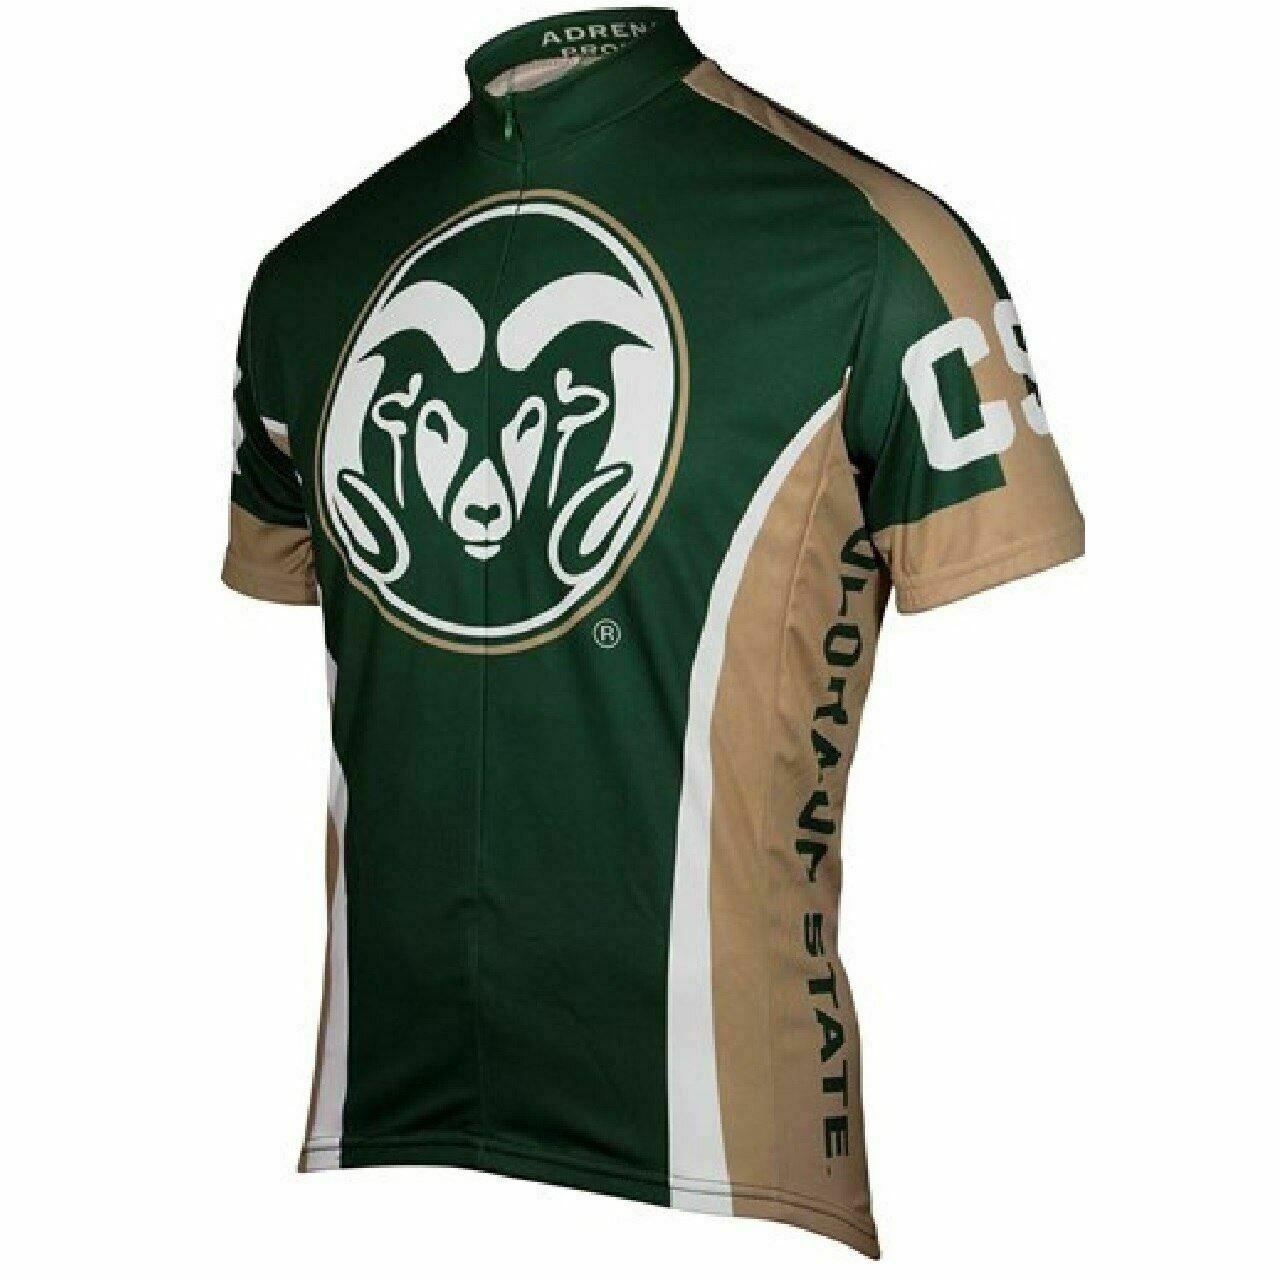 Adrenaline Promo kleurado State University College 3 4 zip mannen's Cycling Jersey